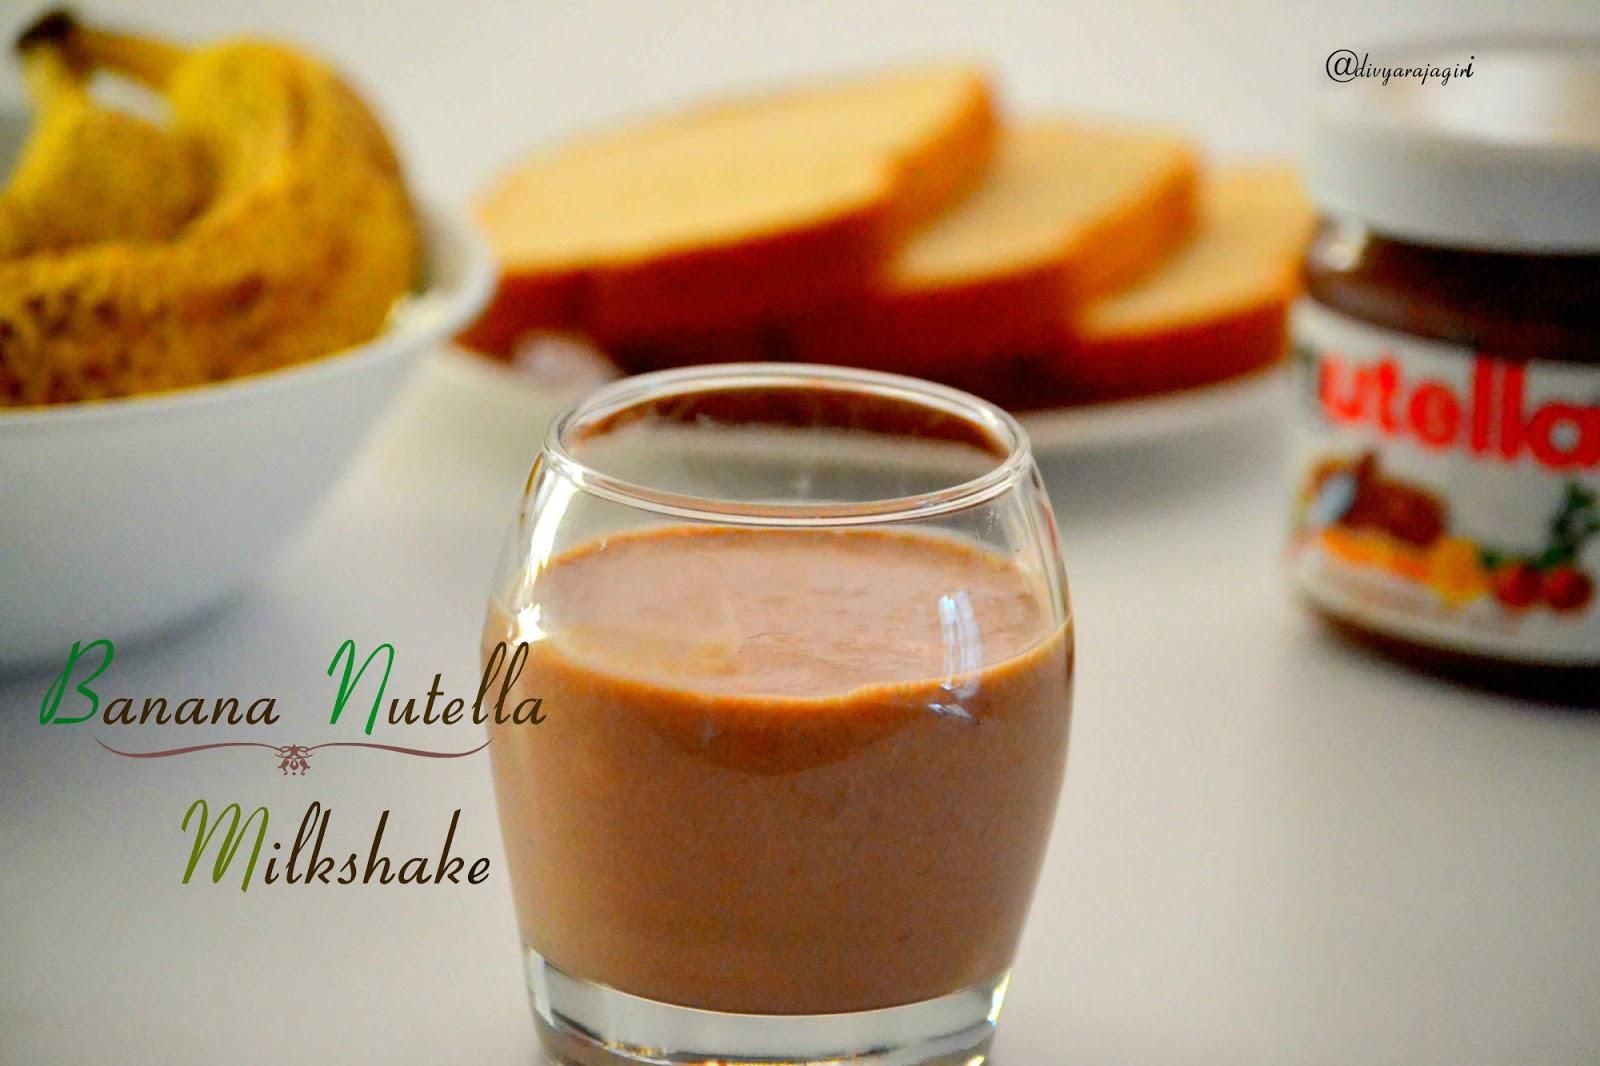 how to make a nutella banana milkshake